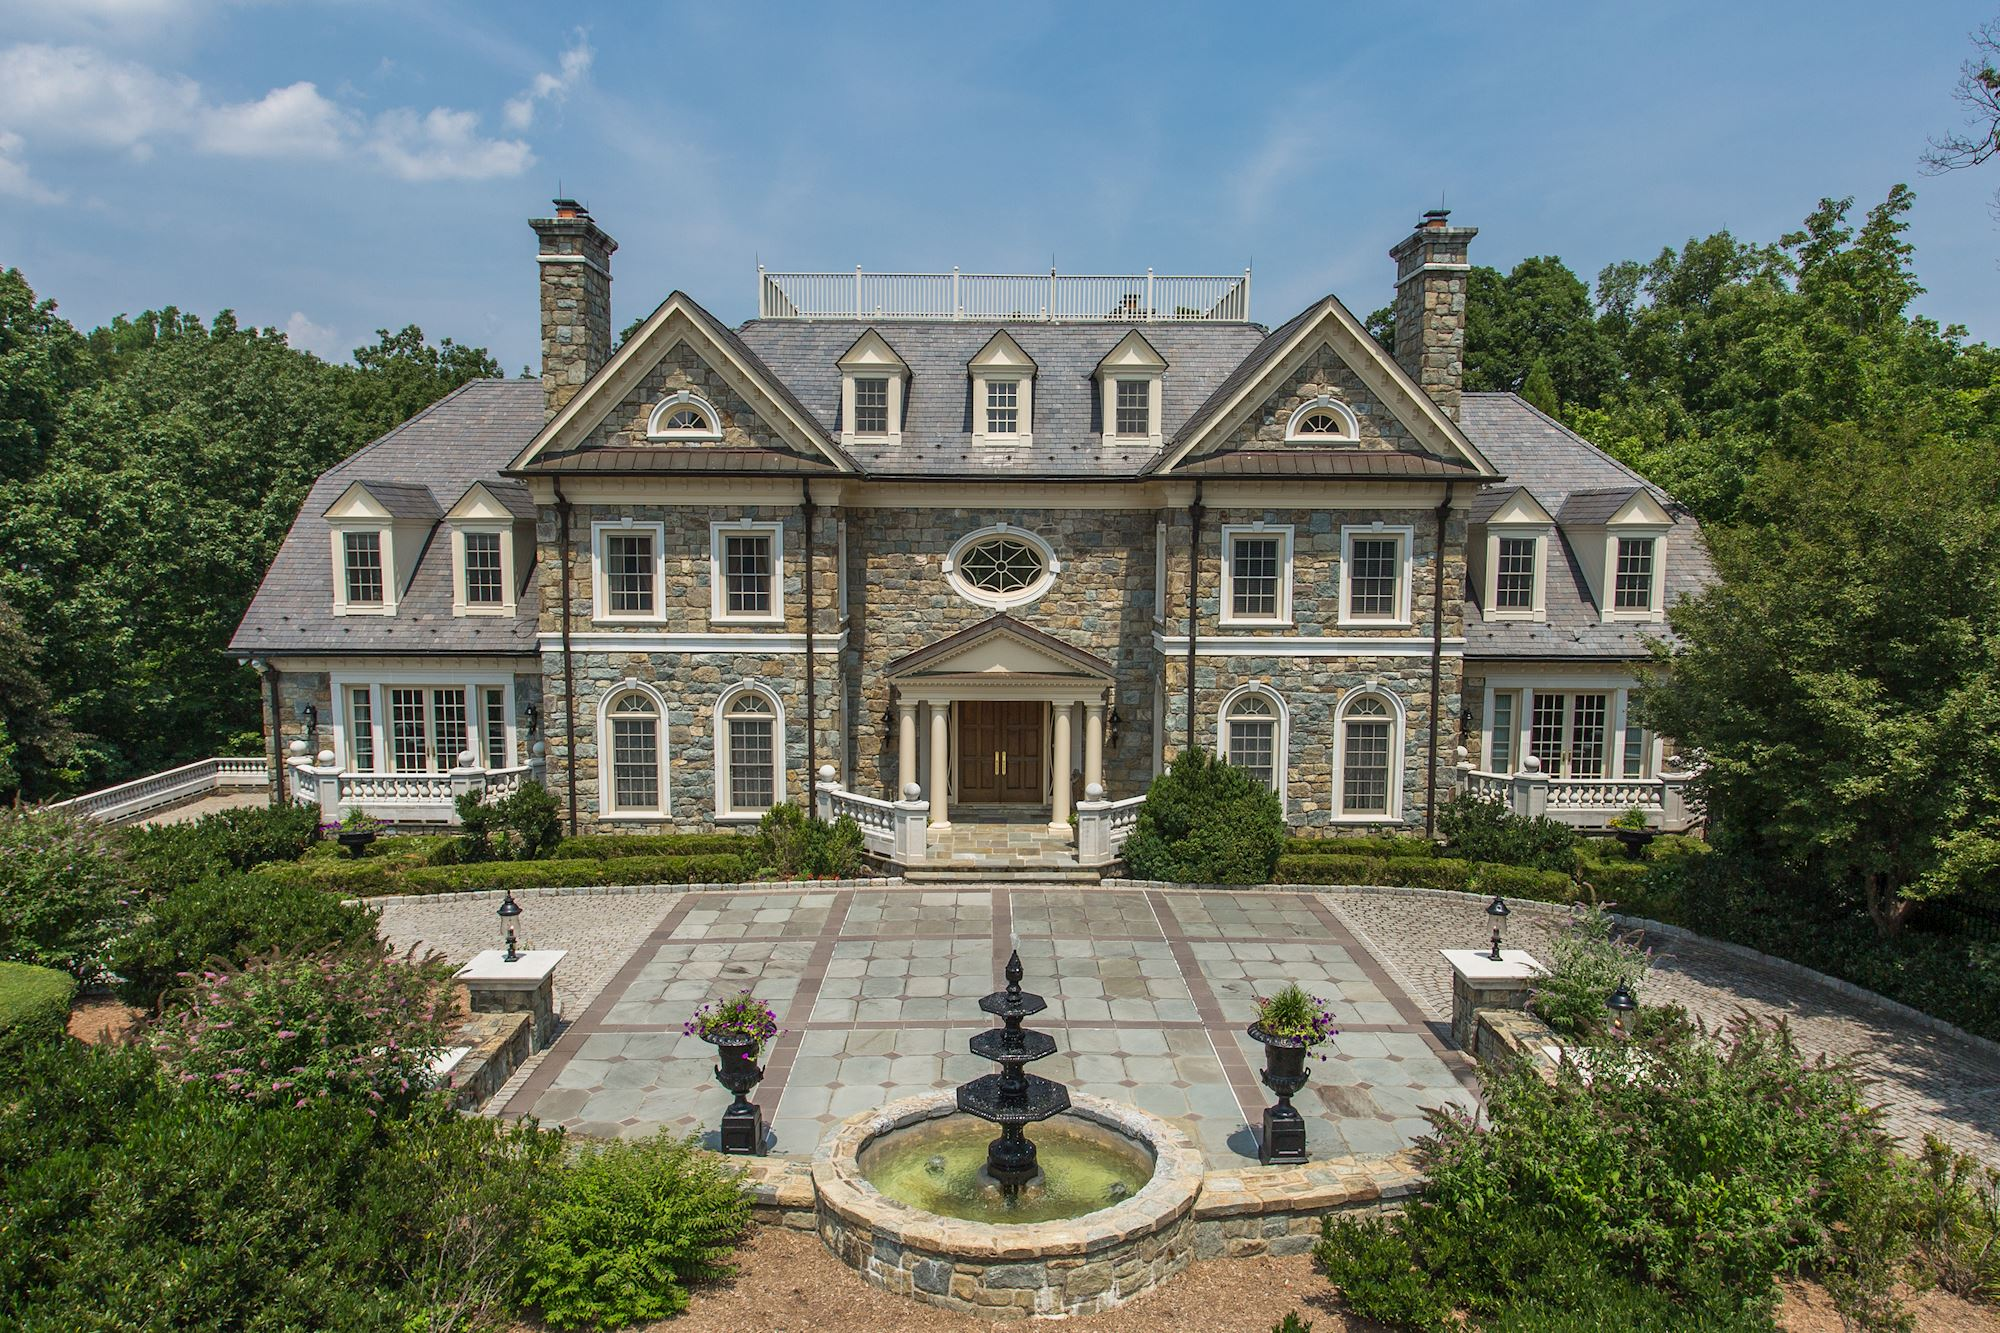 5 House Billion Dollar